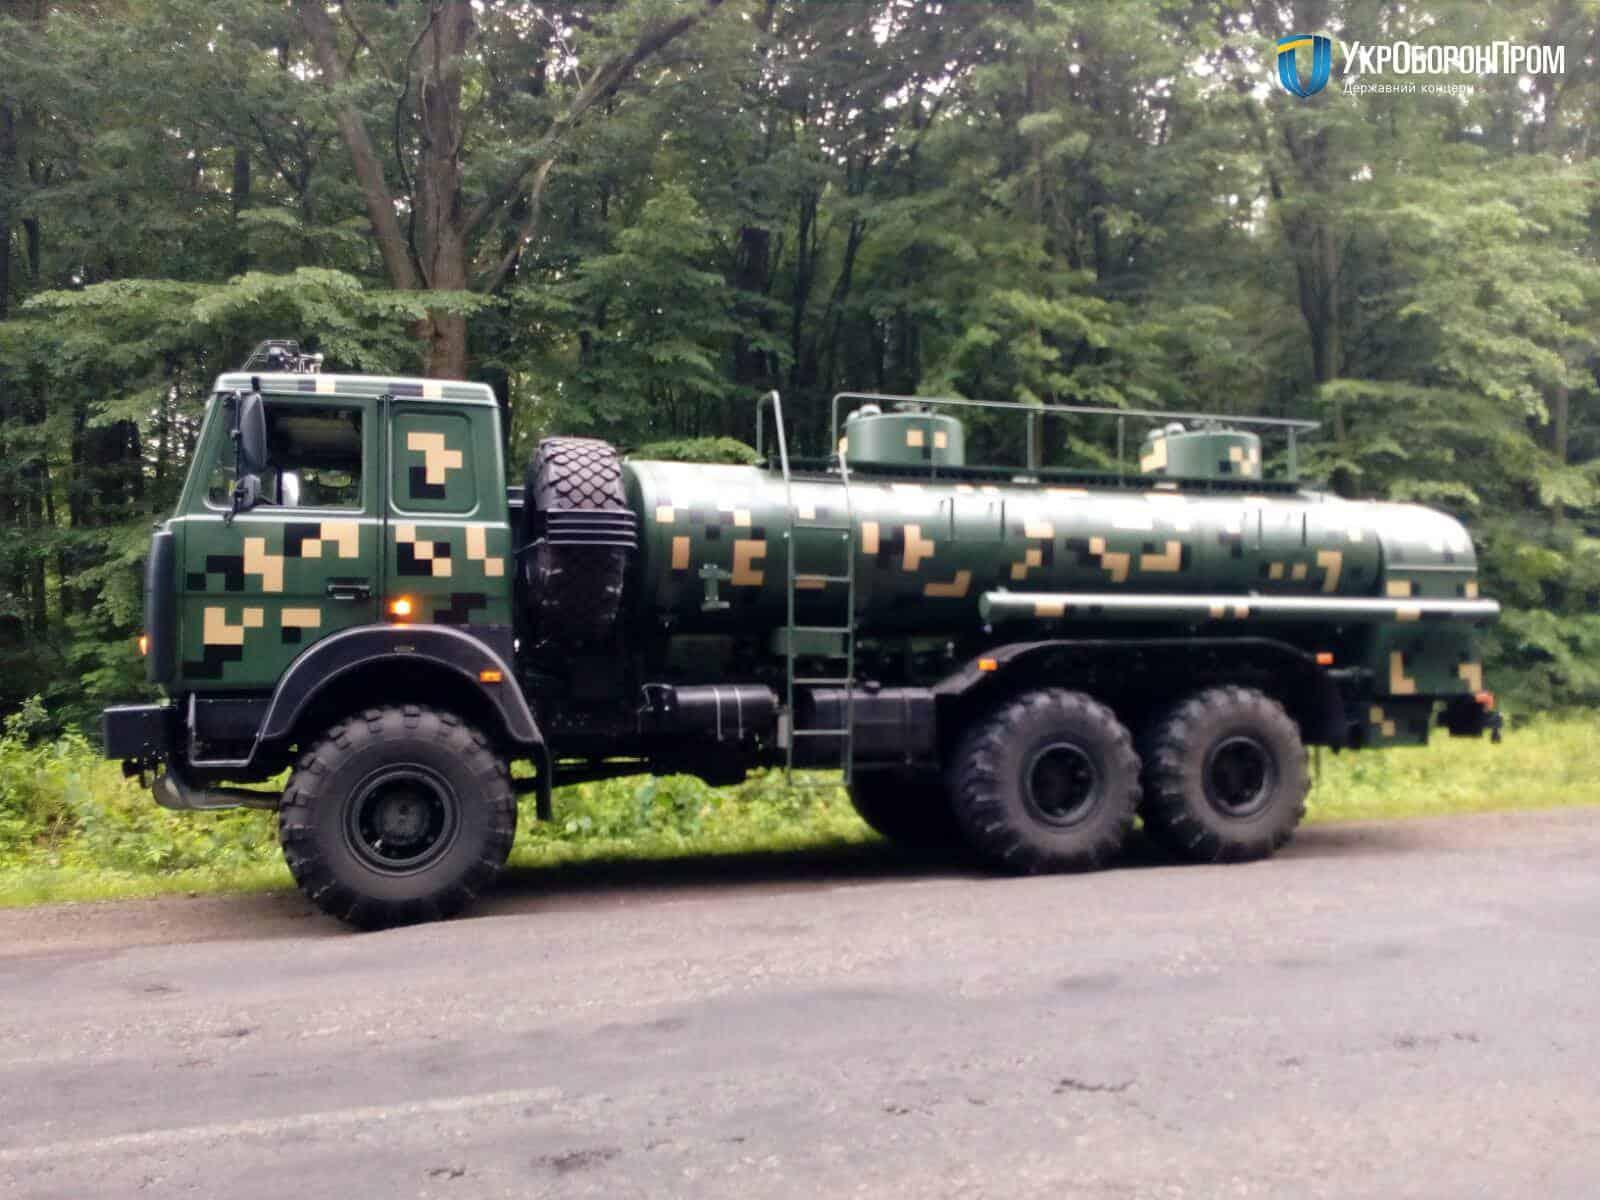 Автоцистерна АЦ-12 63221 передана Міністерству оборони України